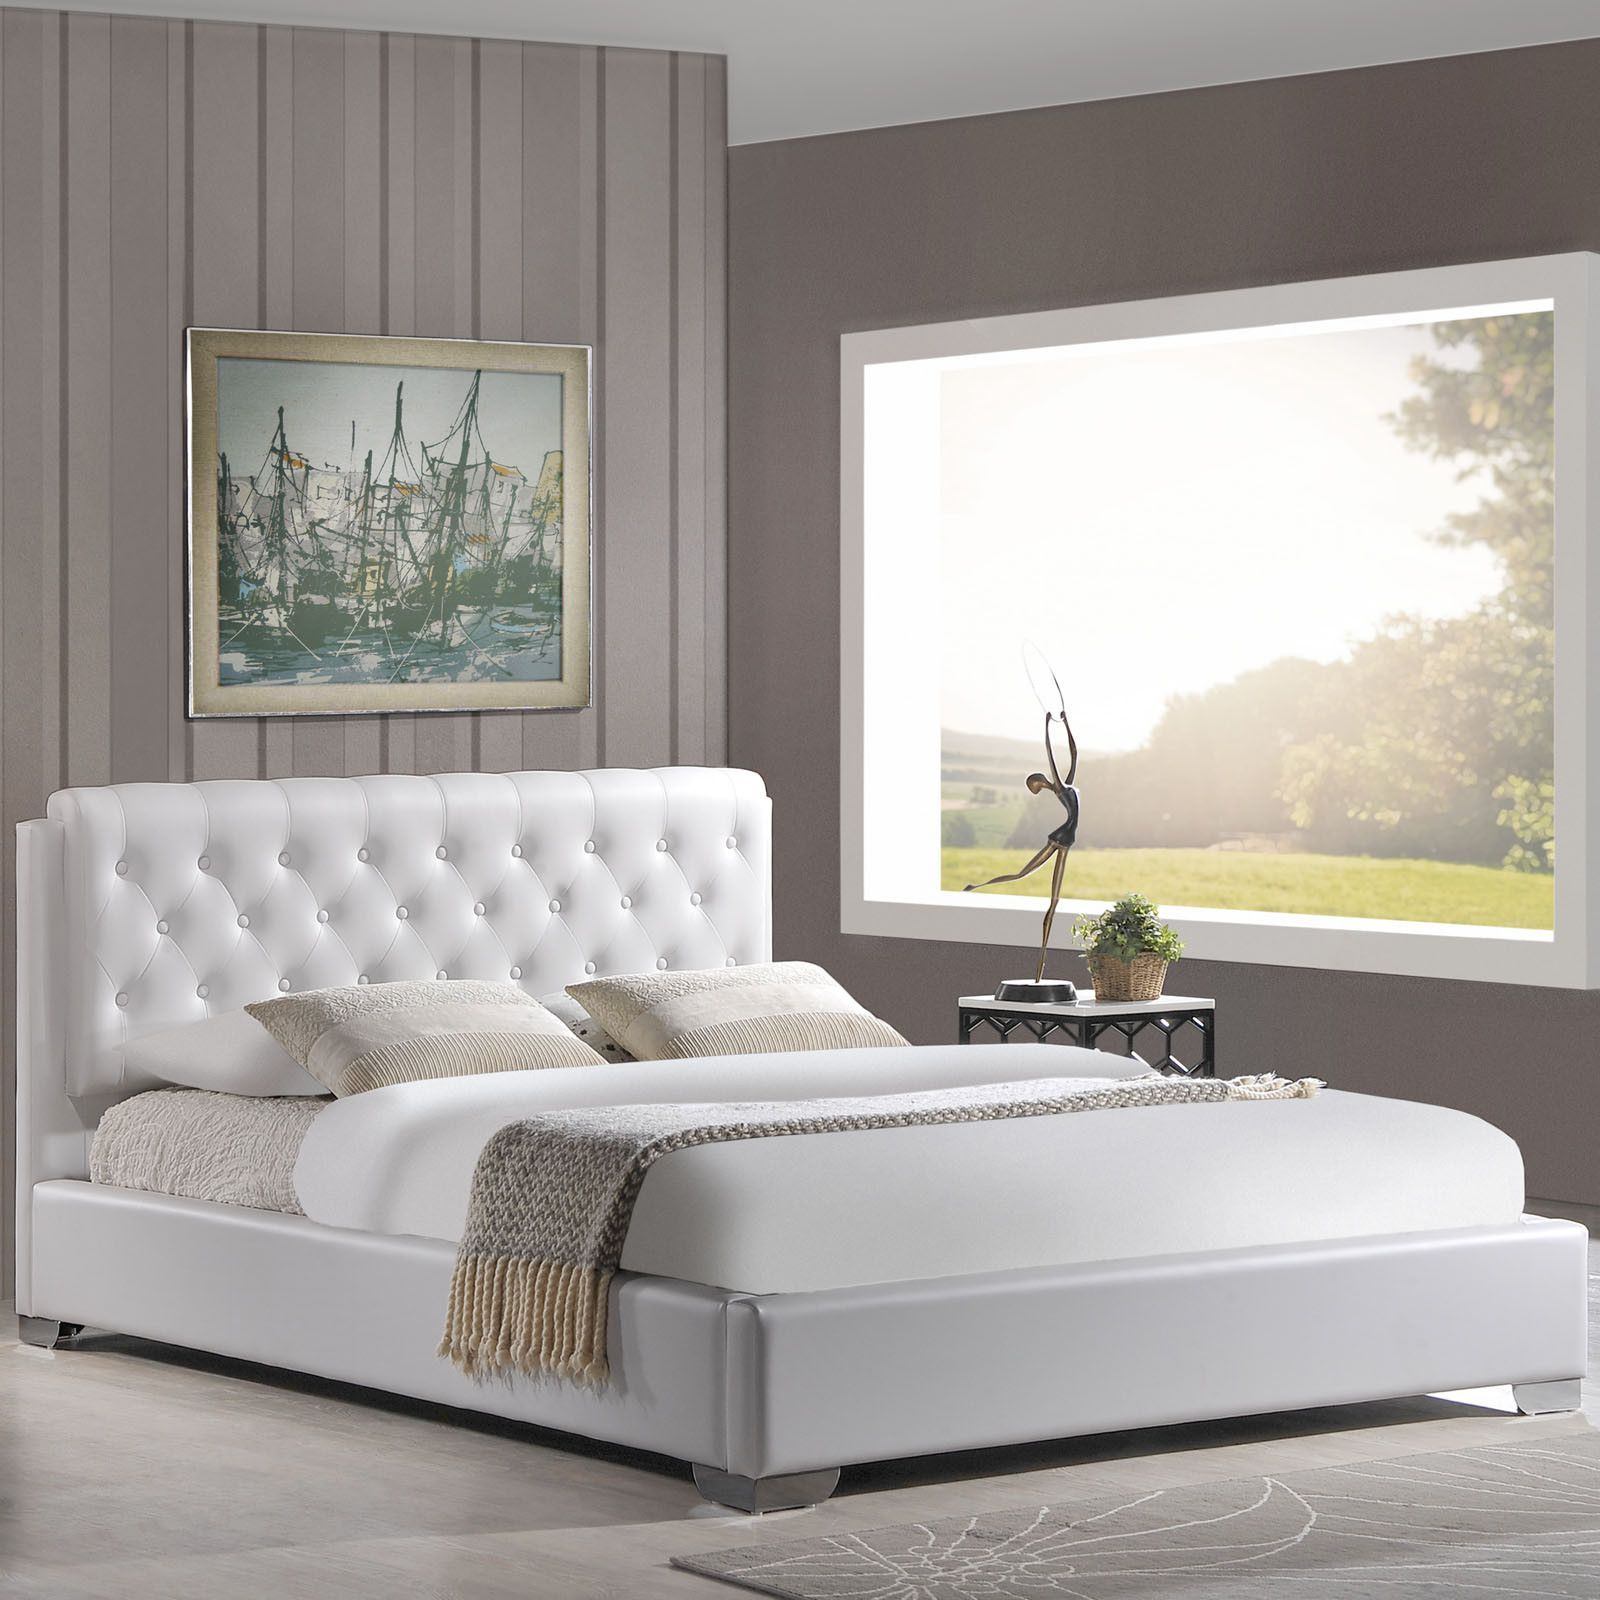 Anne Queen Bed Frame Upholstered platform bed queen